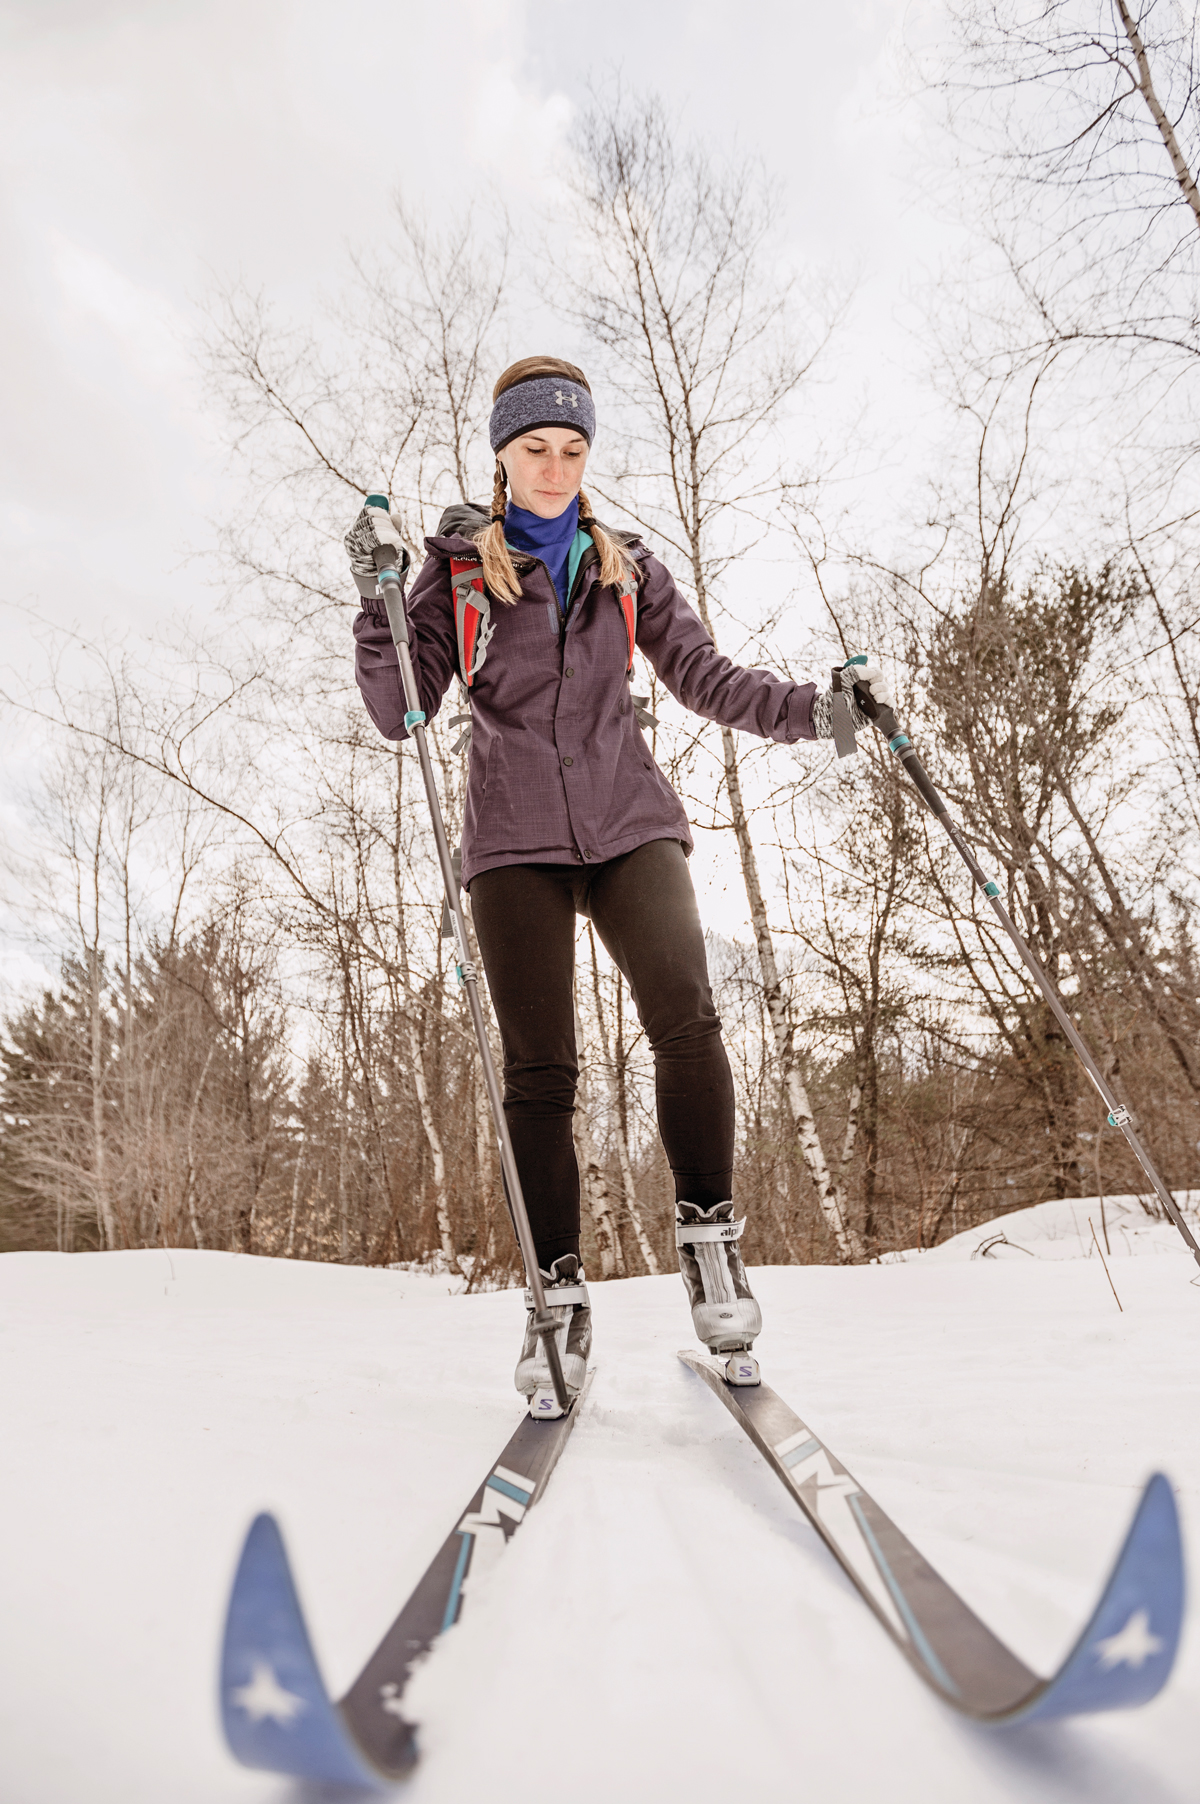 Maine cross-country skiing